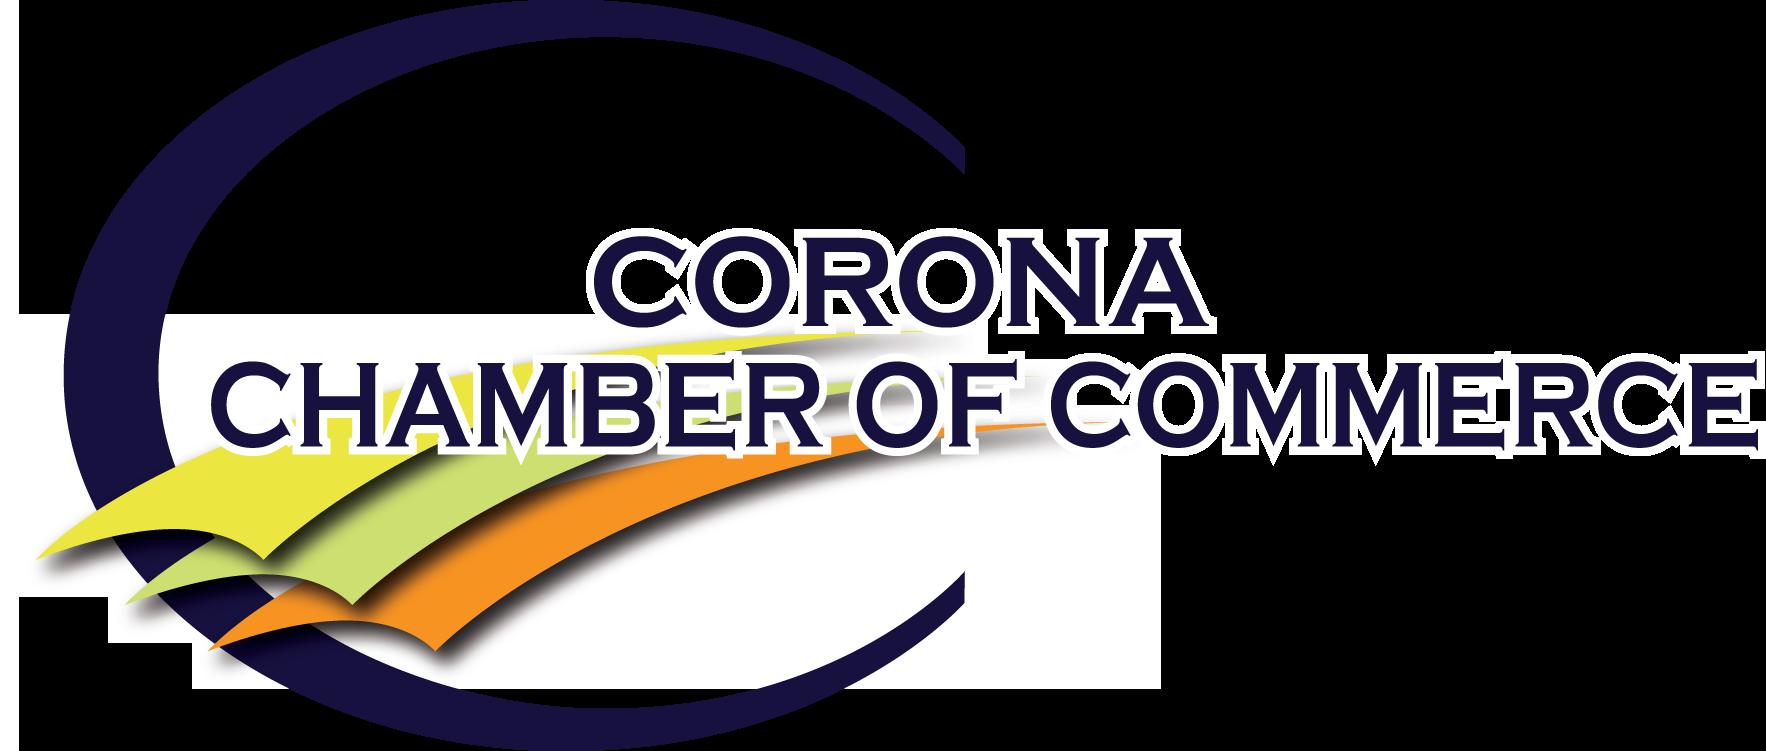 Corona Chamber